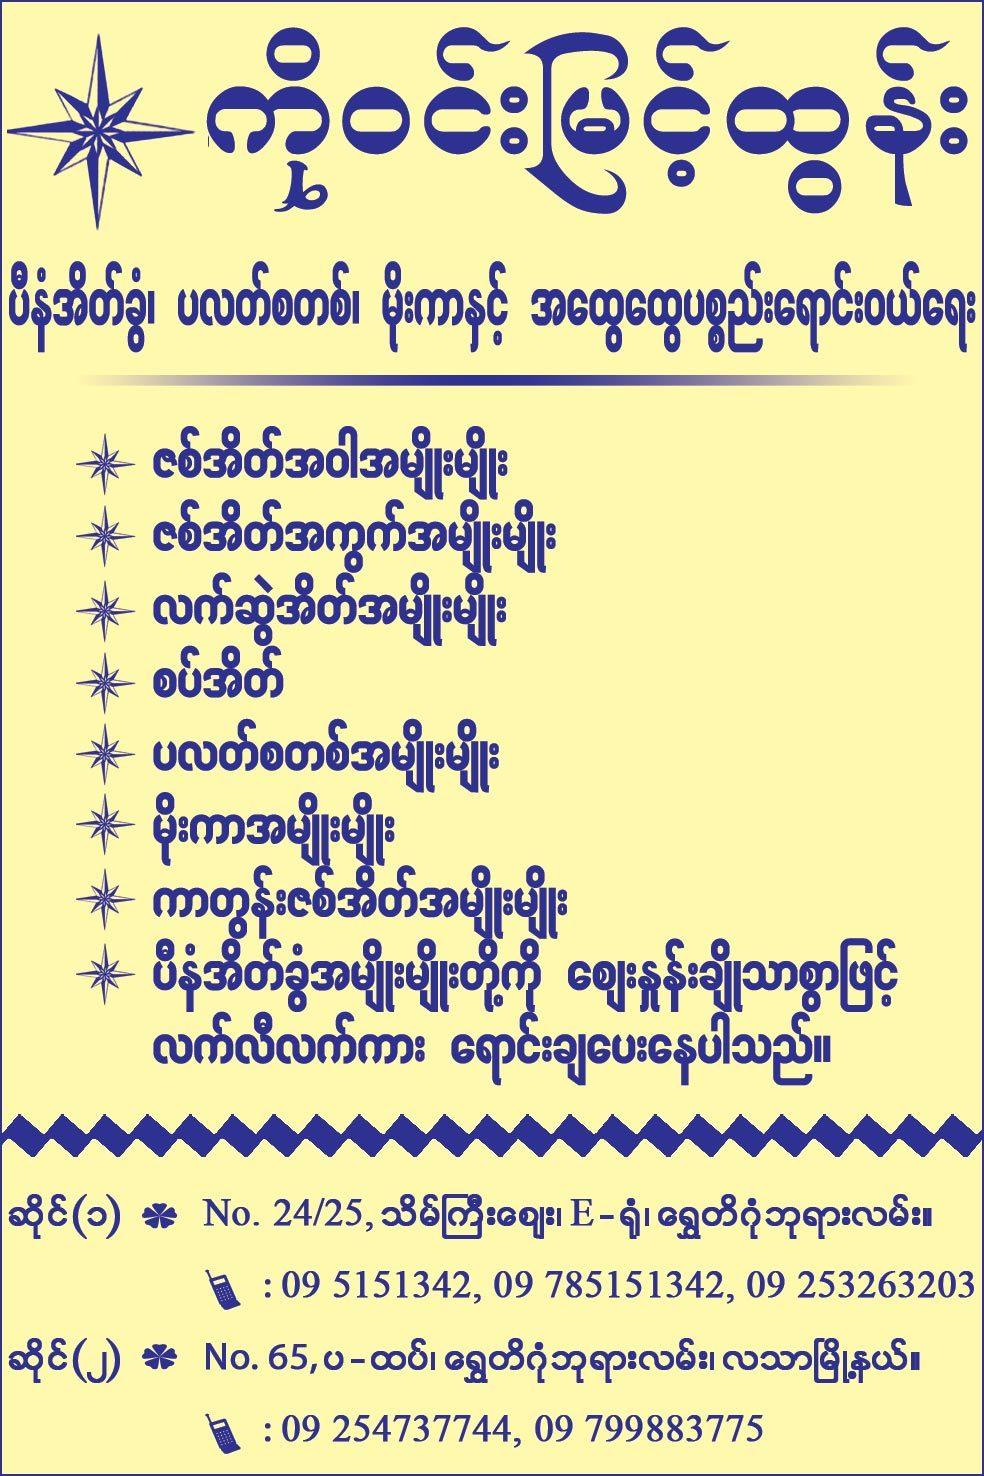 Ko-Win-Myint-Tun_Bag-(Penang)_(A)_3476.jpg